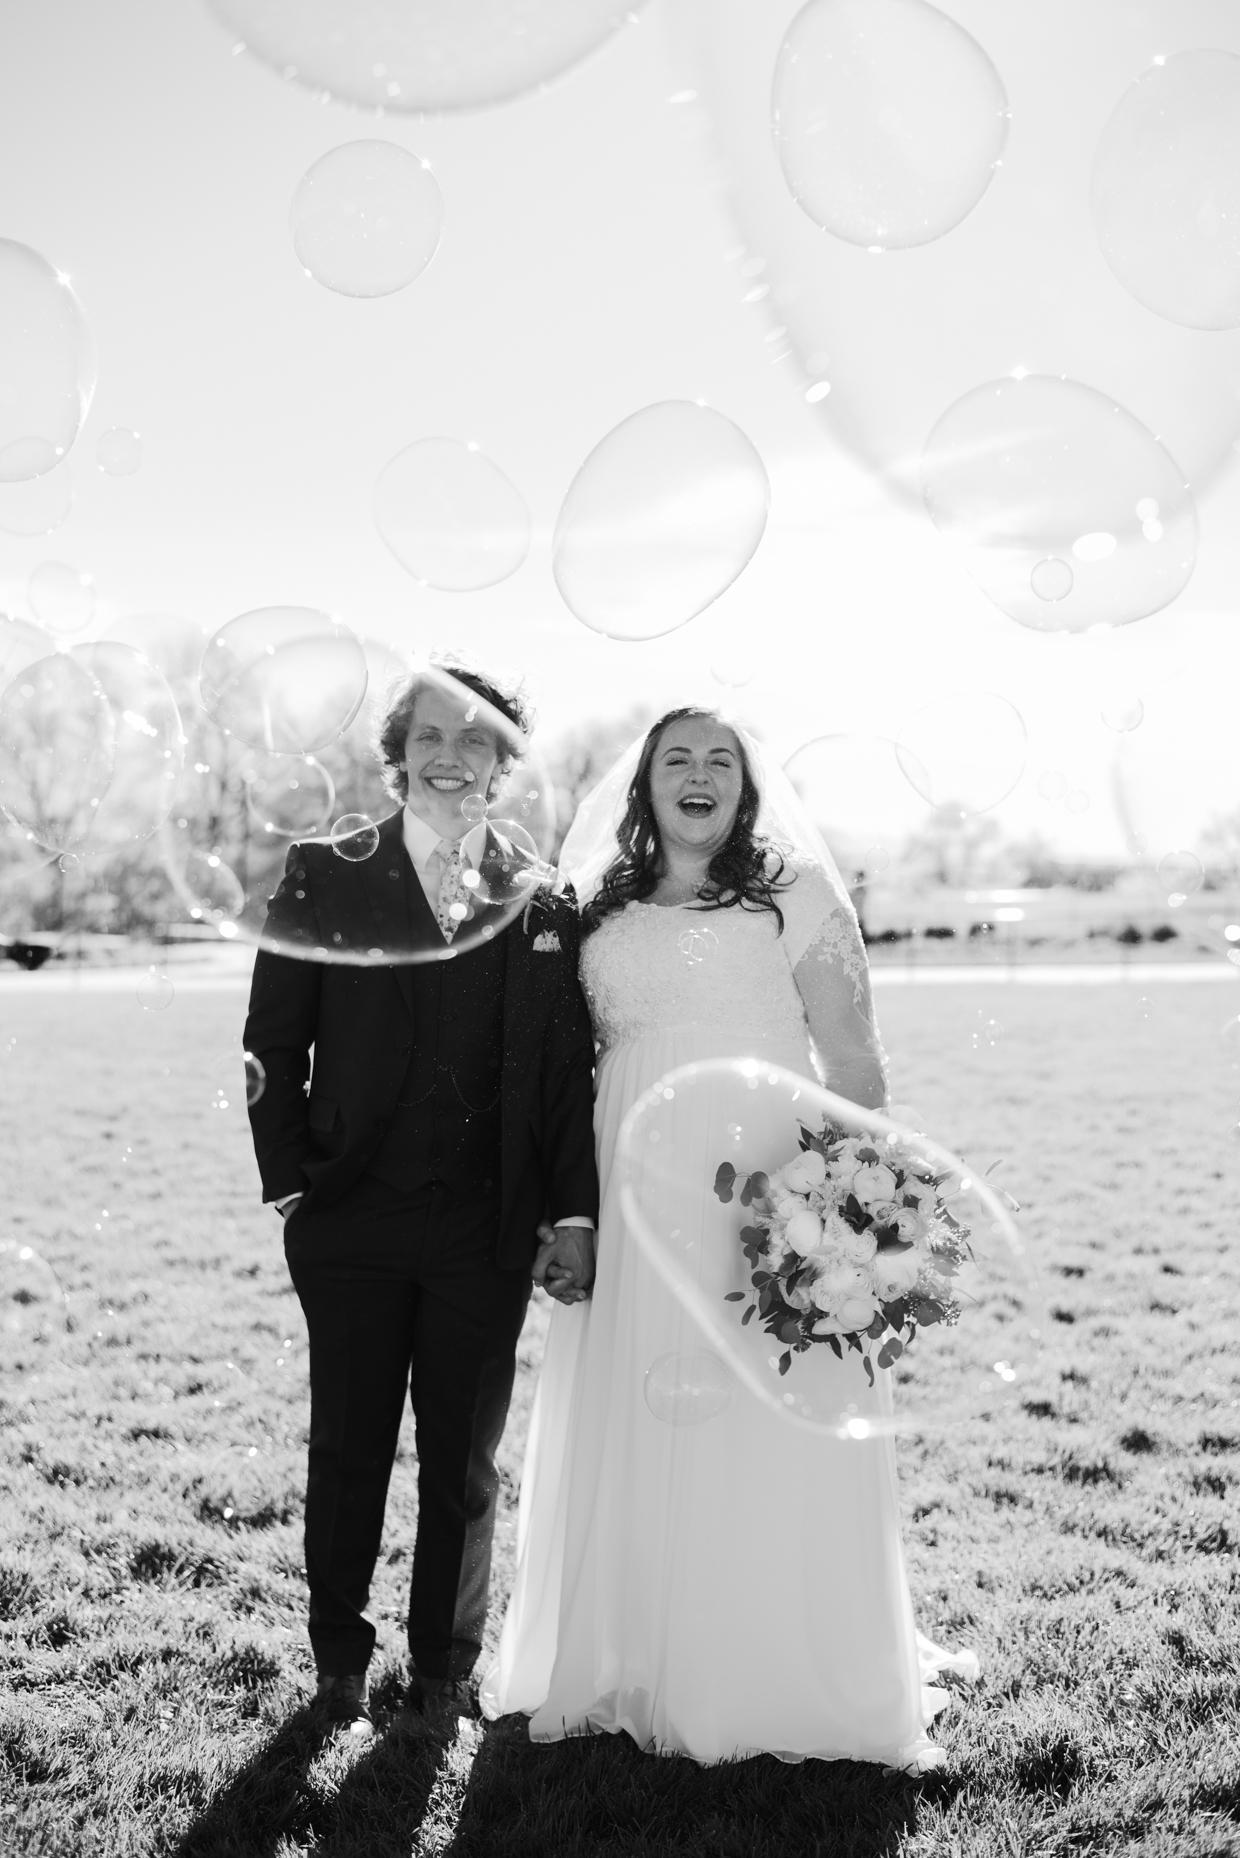 bailey.dayel bridals-17.jpg